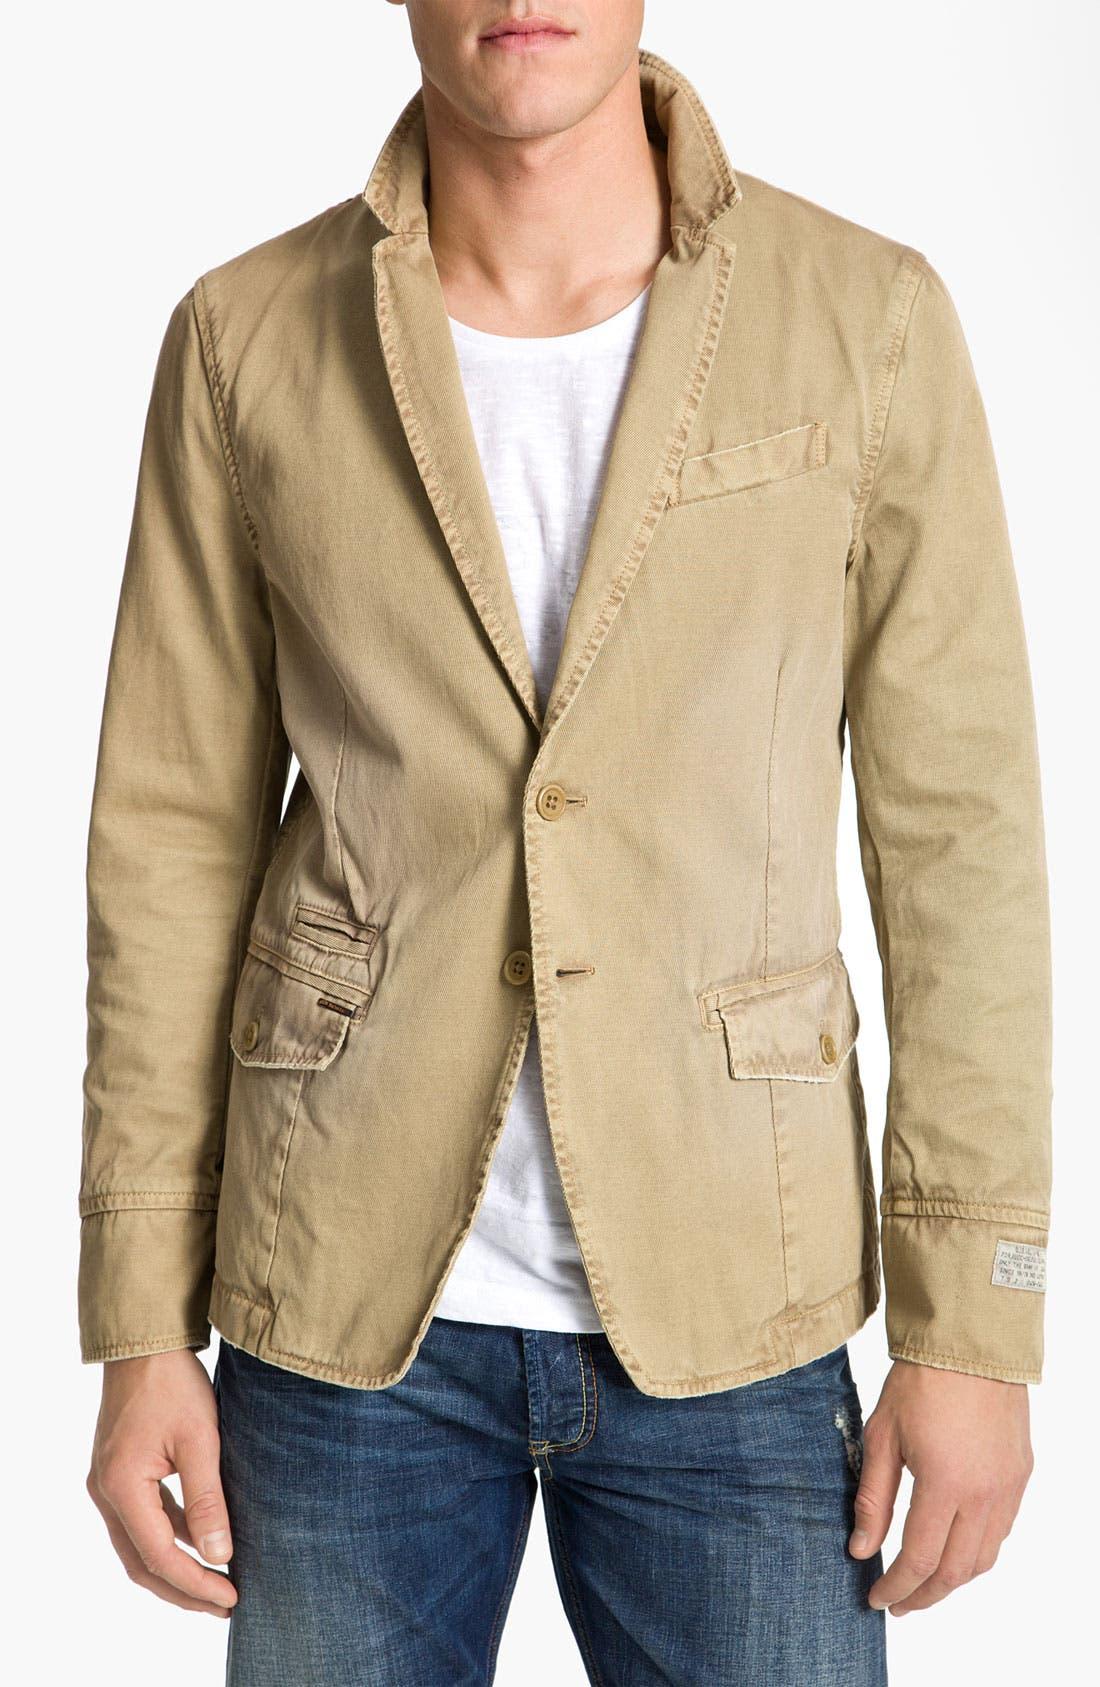 Alternate Image 1 Selected - DIESEL® 'Jelevand' Cotton Twill Blazer